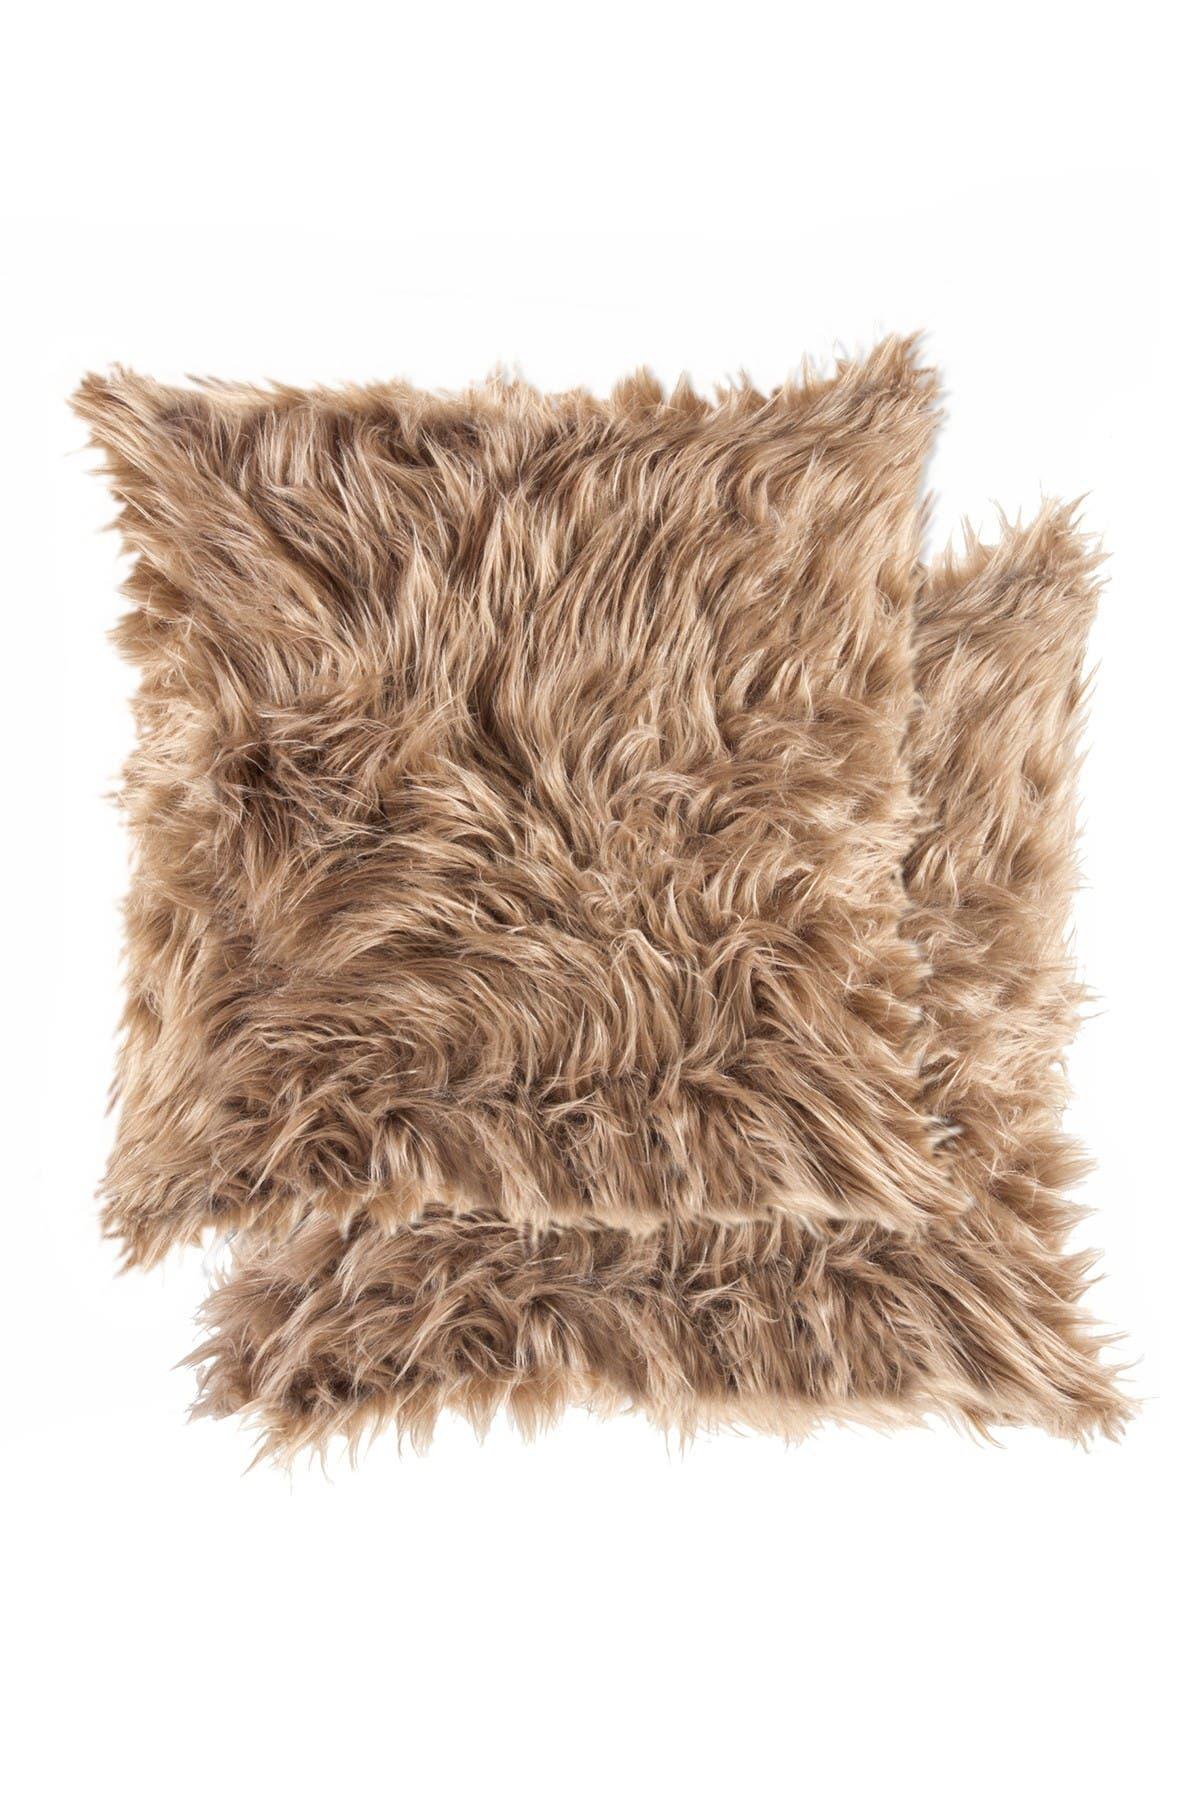 "Image of LUXE Belton Faux Fur Pillow - Set of 2 -18"" x 18"" - Tan"